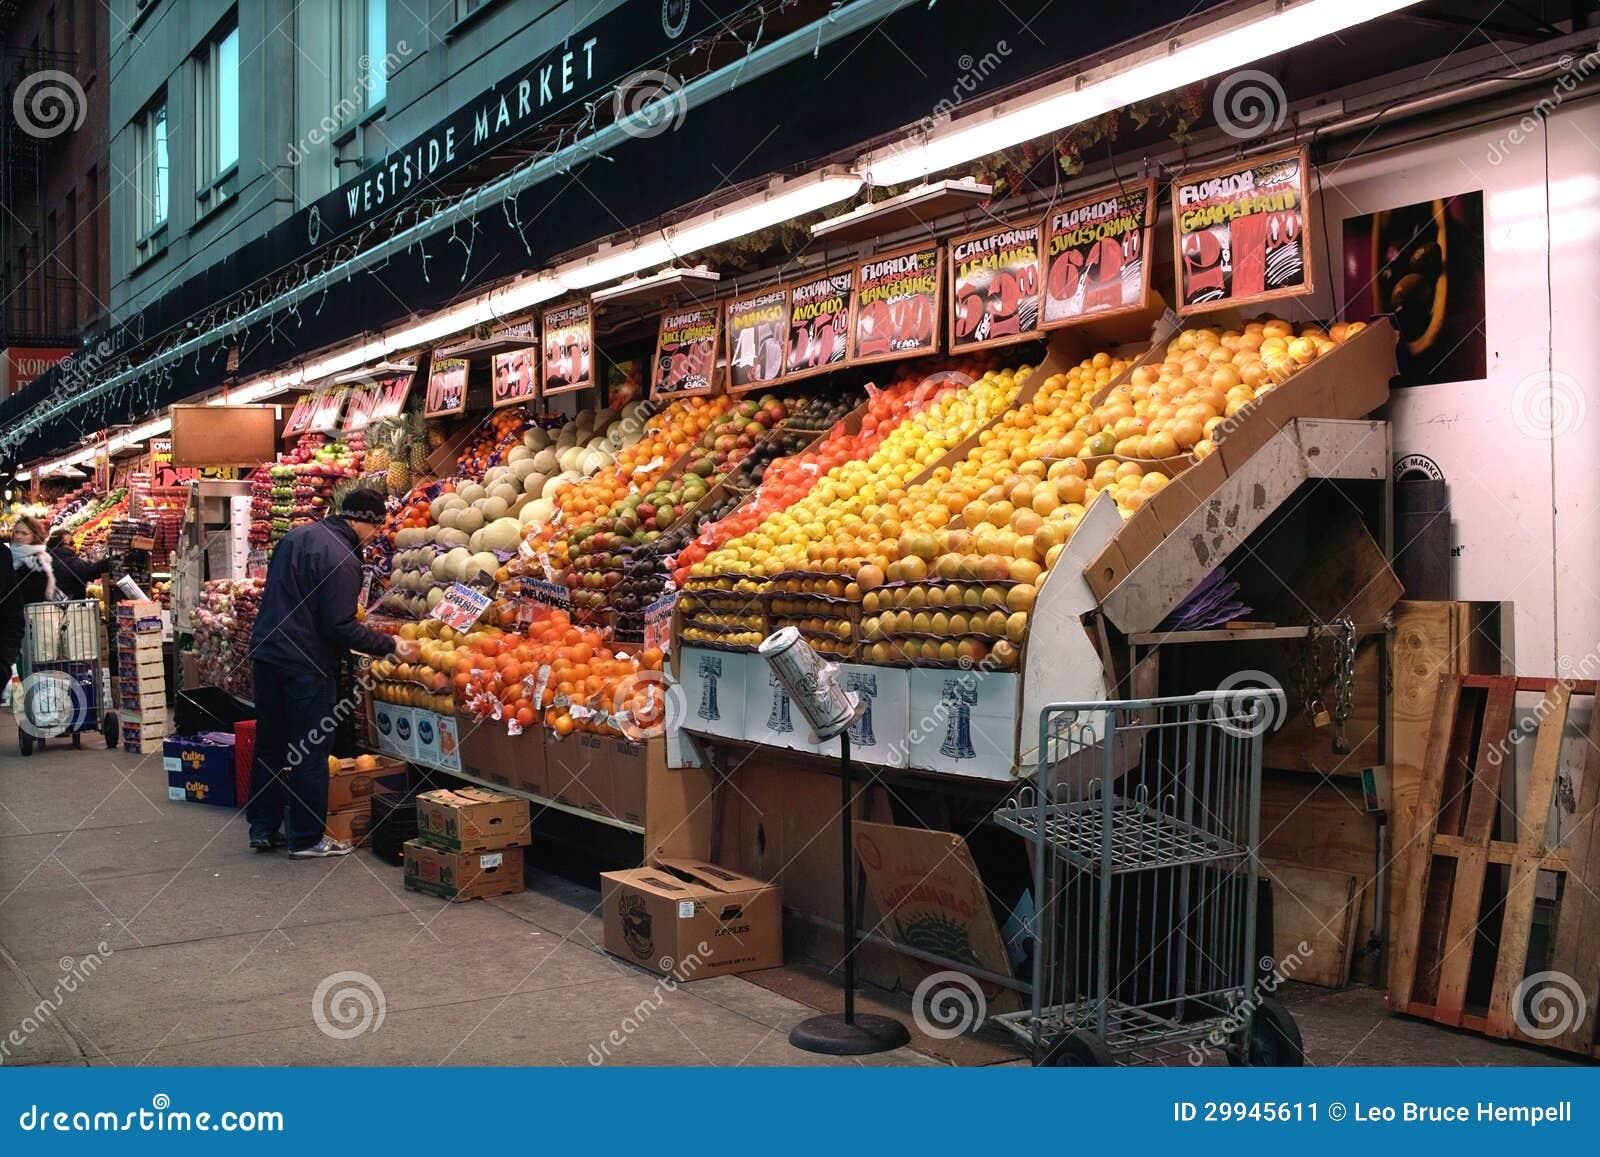 All Night Market, New York editorial photo  Image of fruit